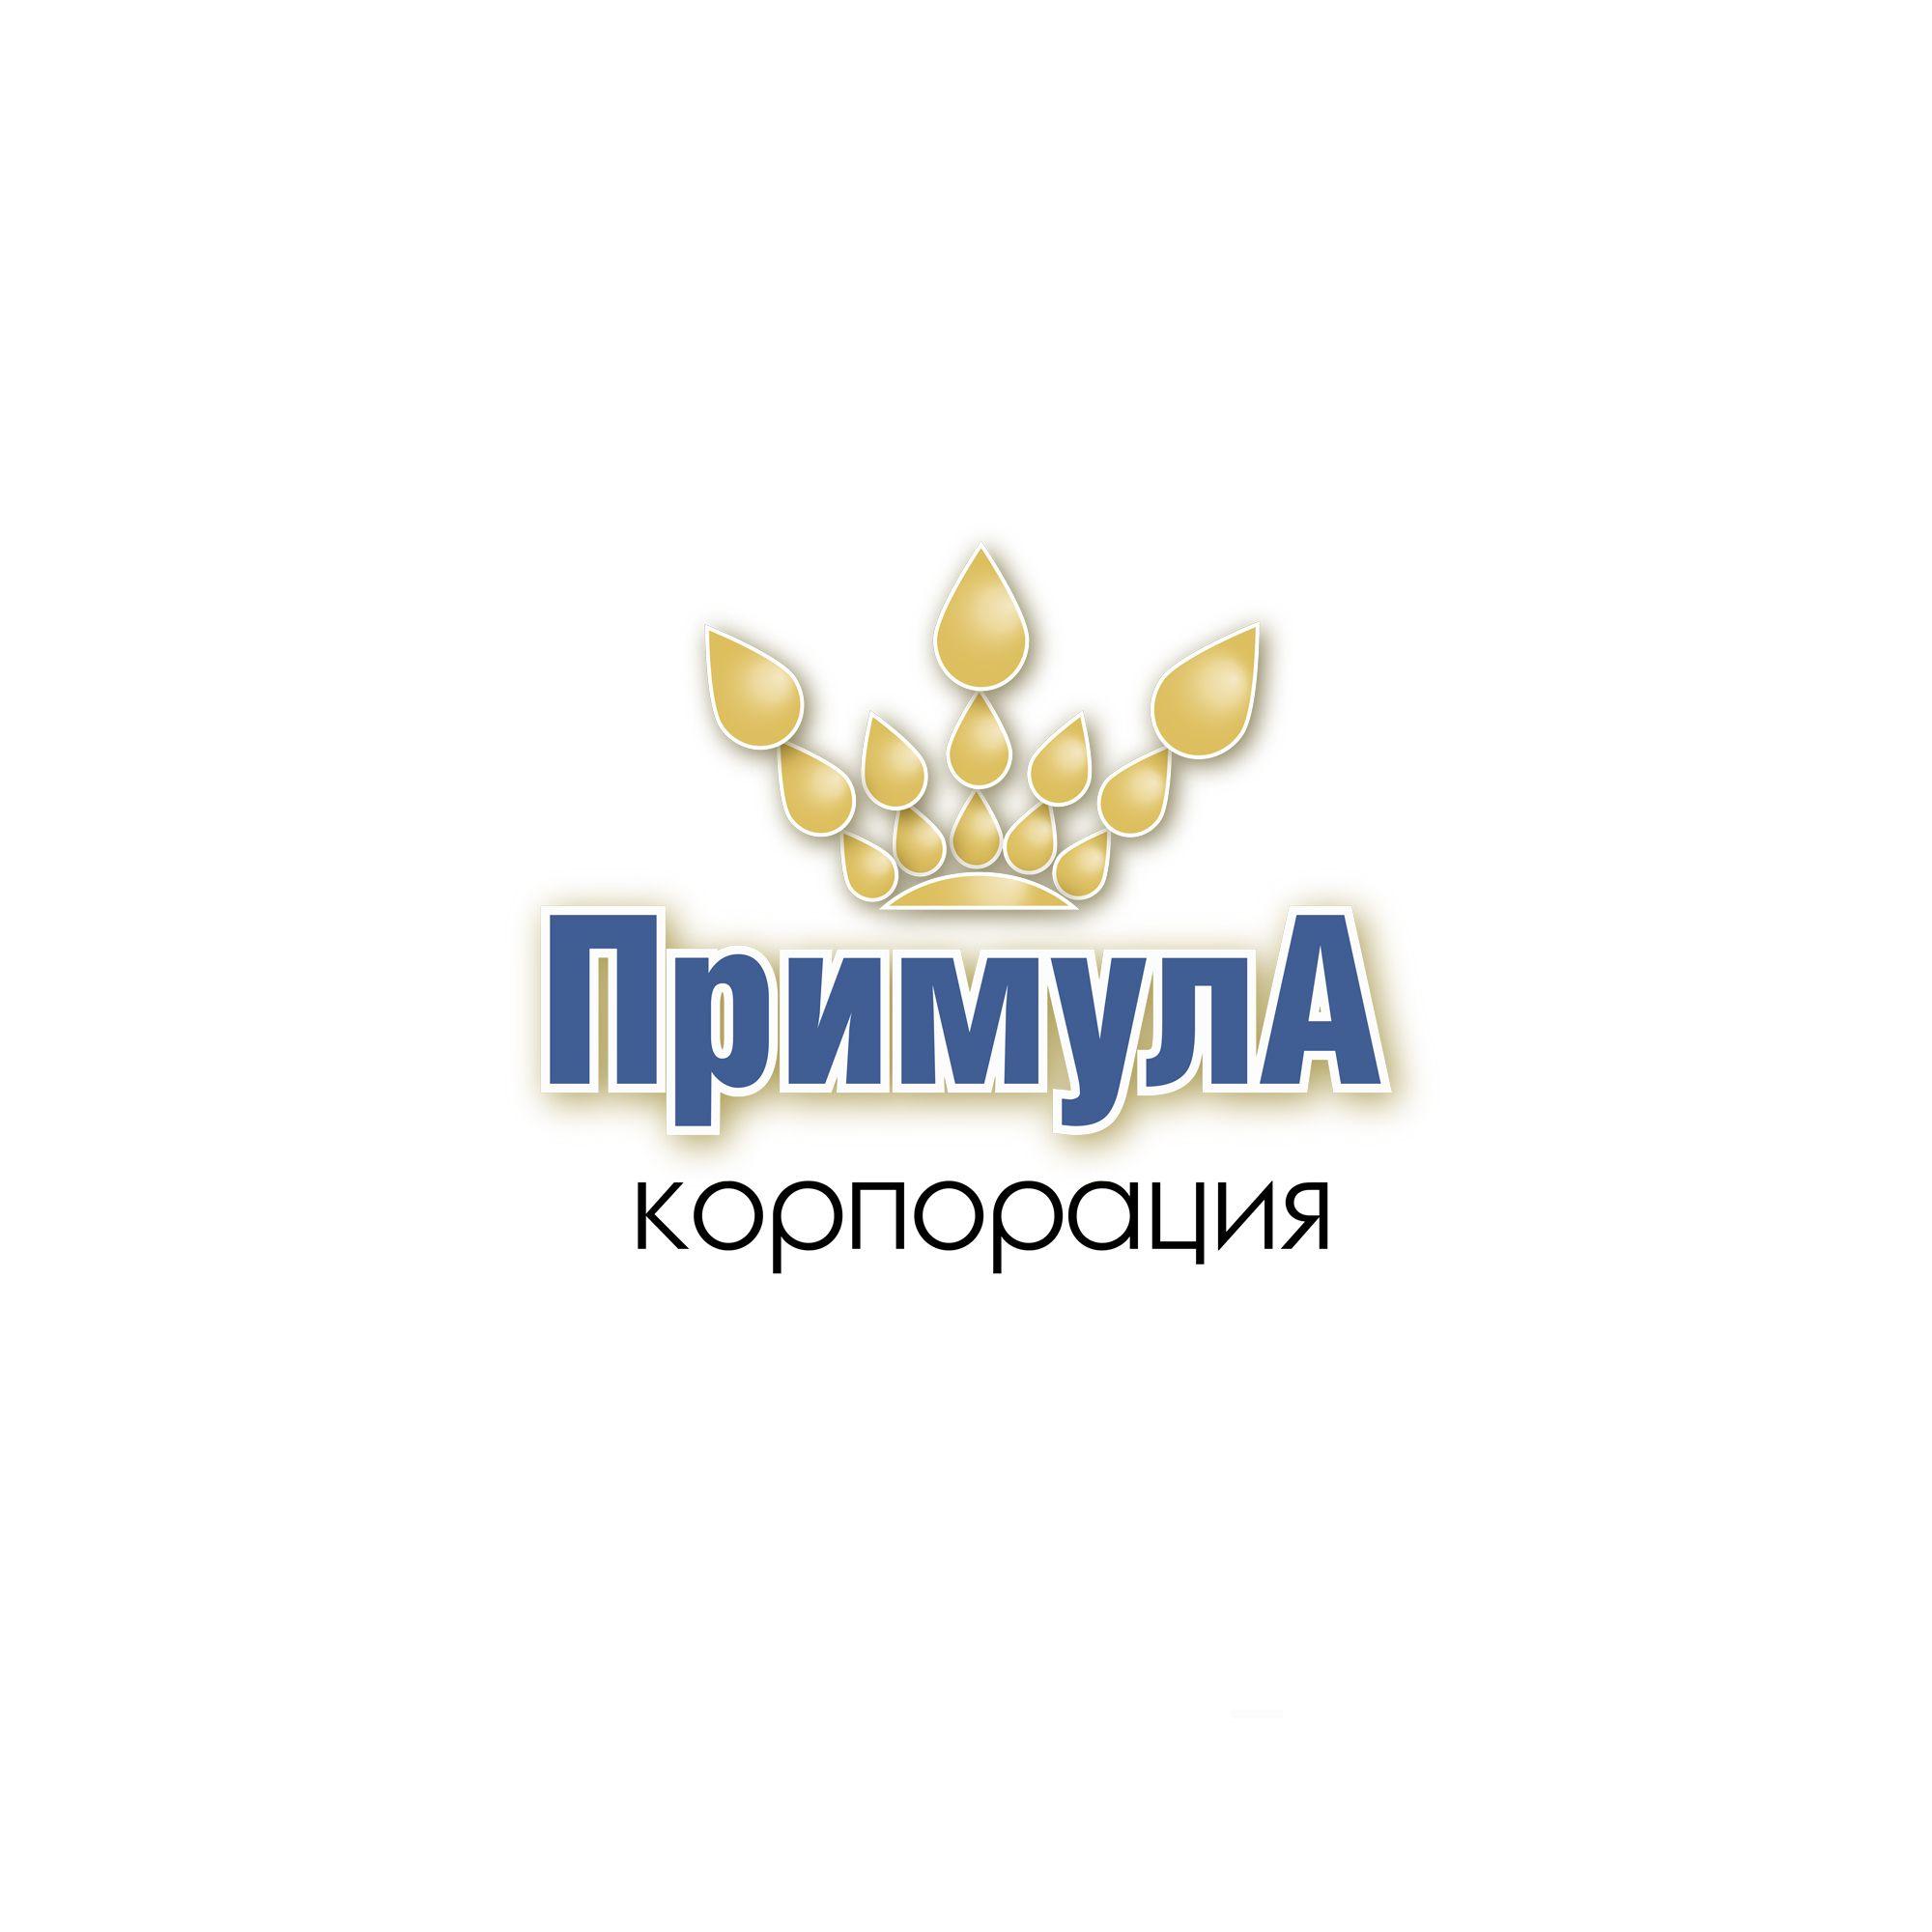 Логотип для группы компаний - дизайнер atmannn